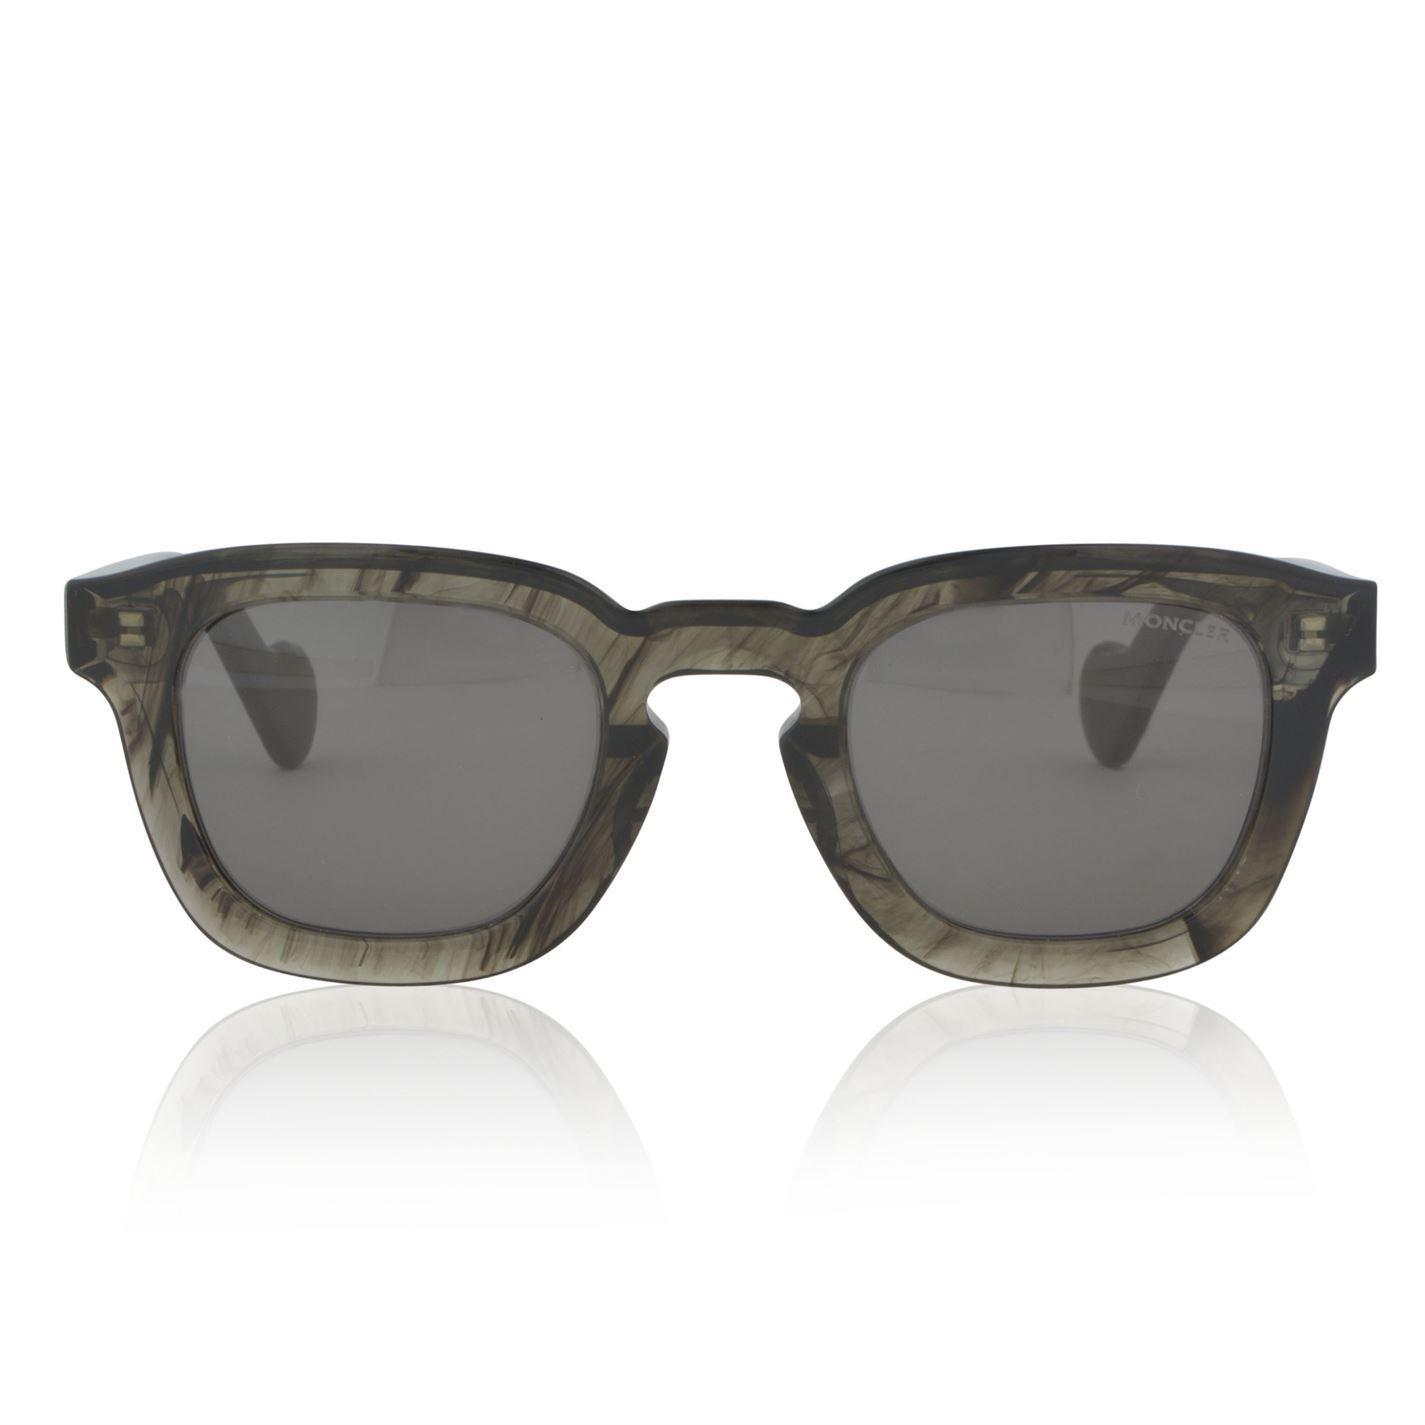 ae1dbf4ba Moncler Ml 0009 Vintage Wayfarer Sunglasses in Gray - Lyst